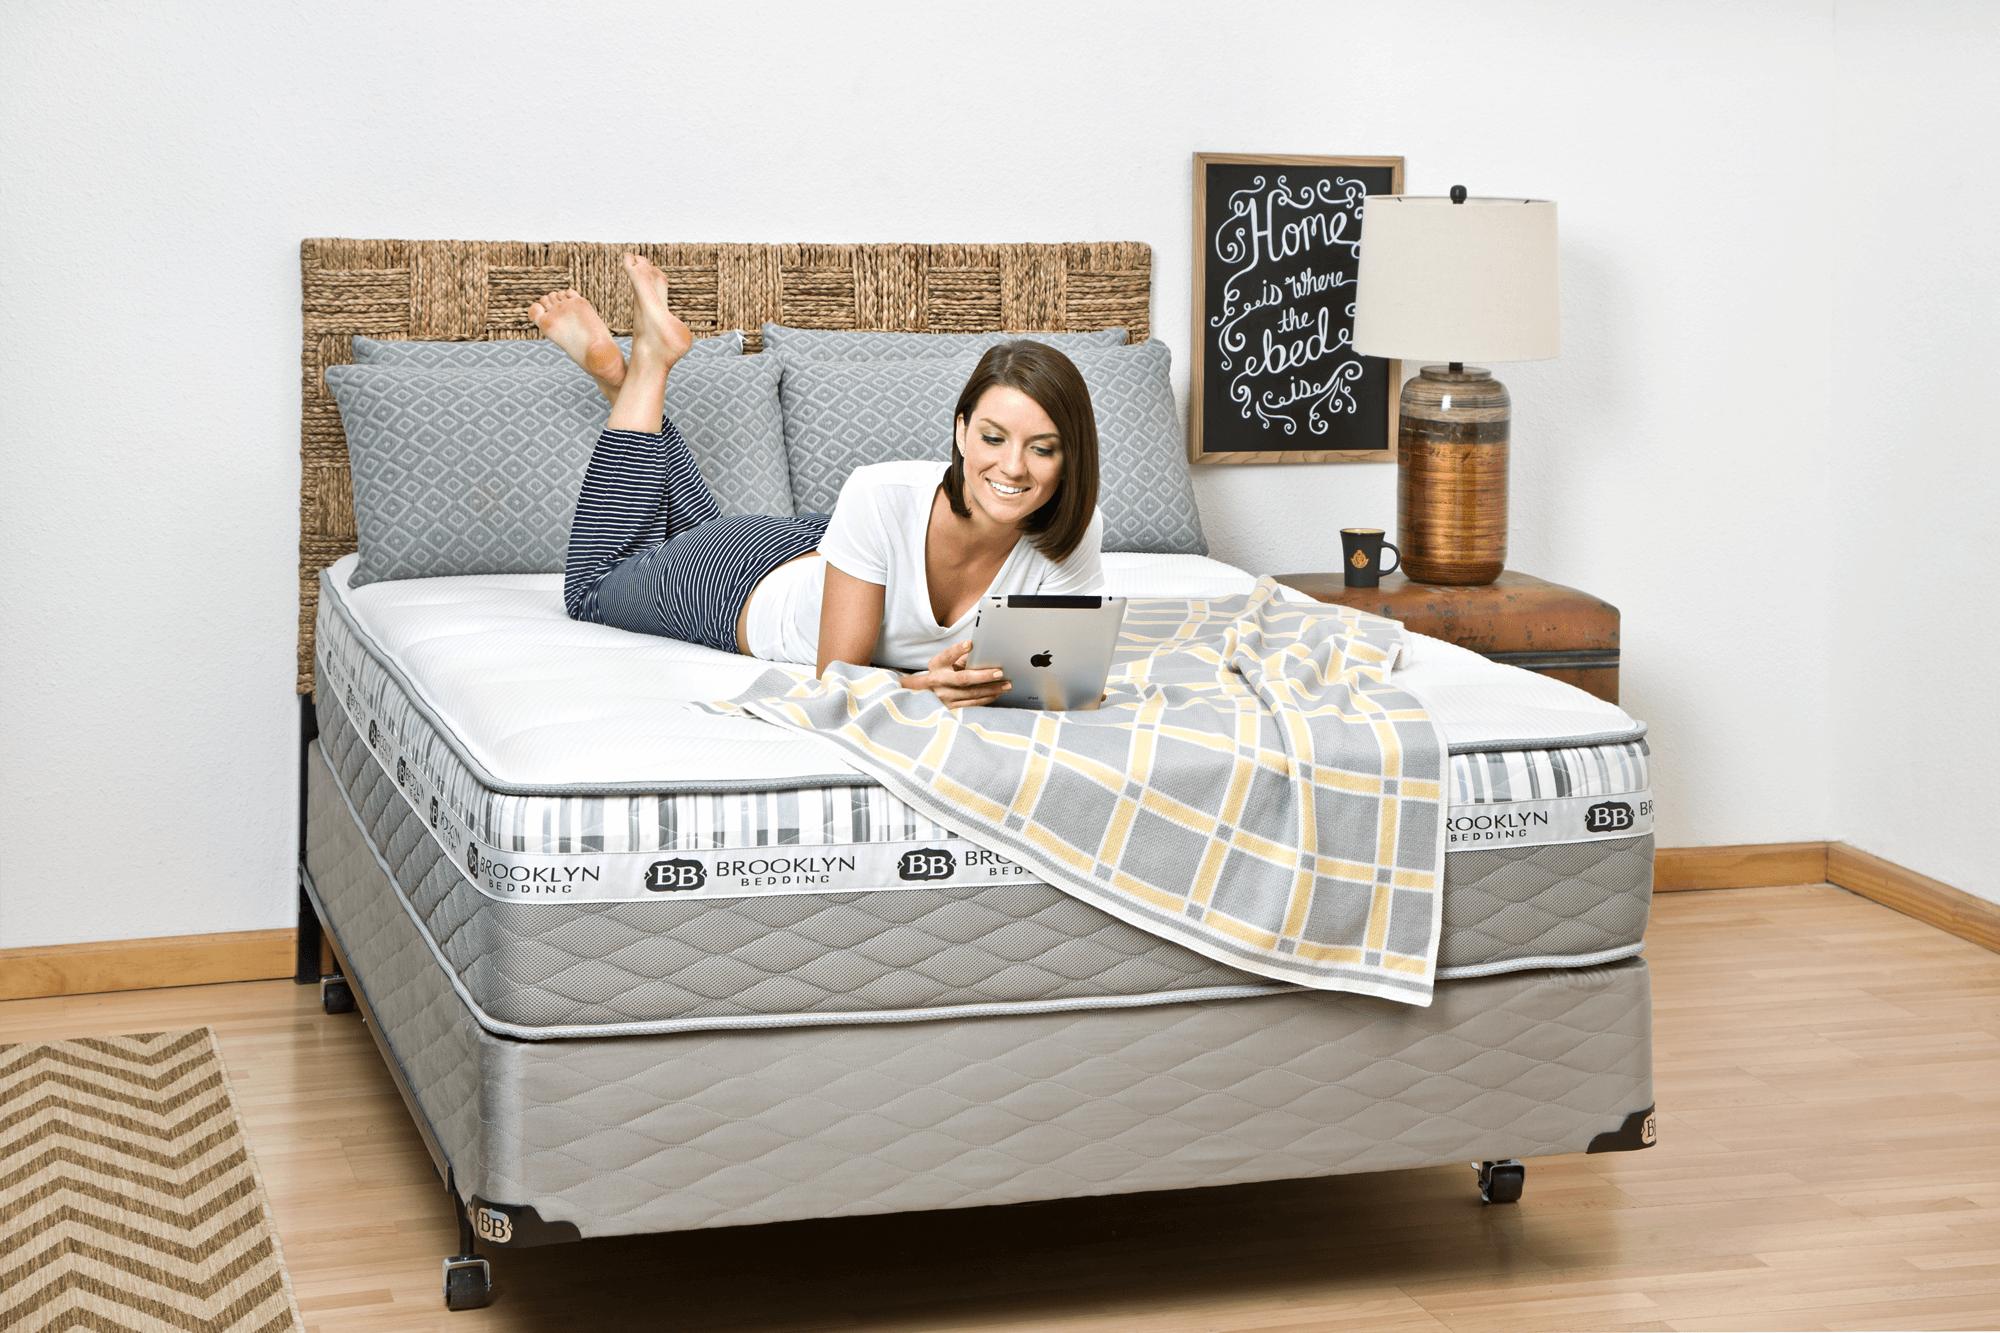 Brooklyn Bed Mattress Review